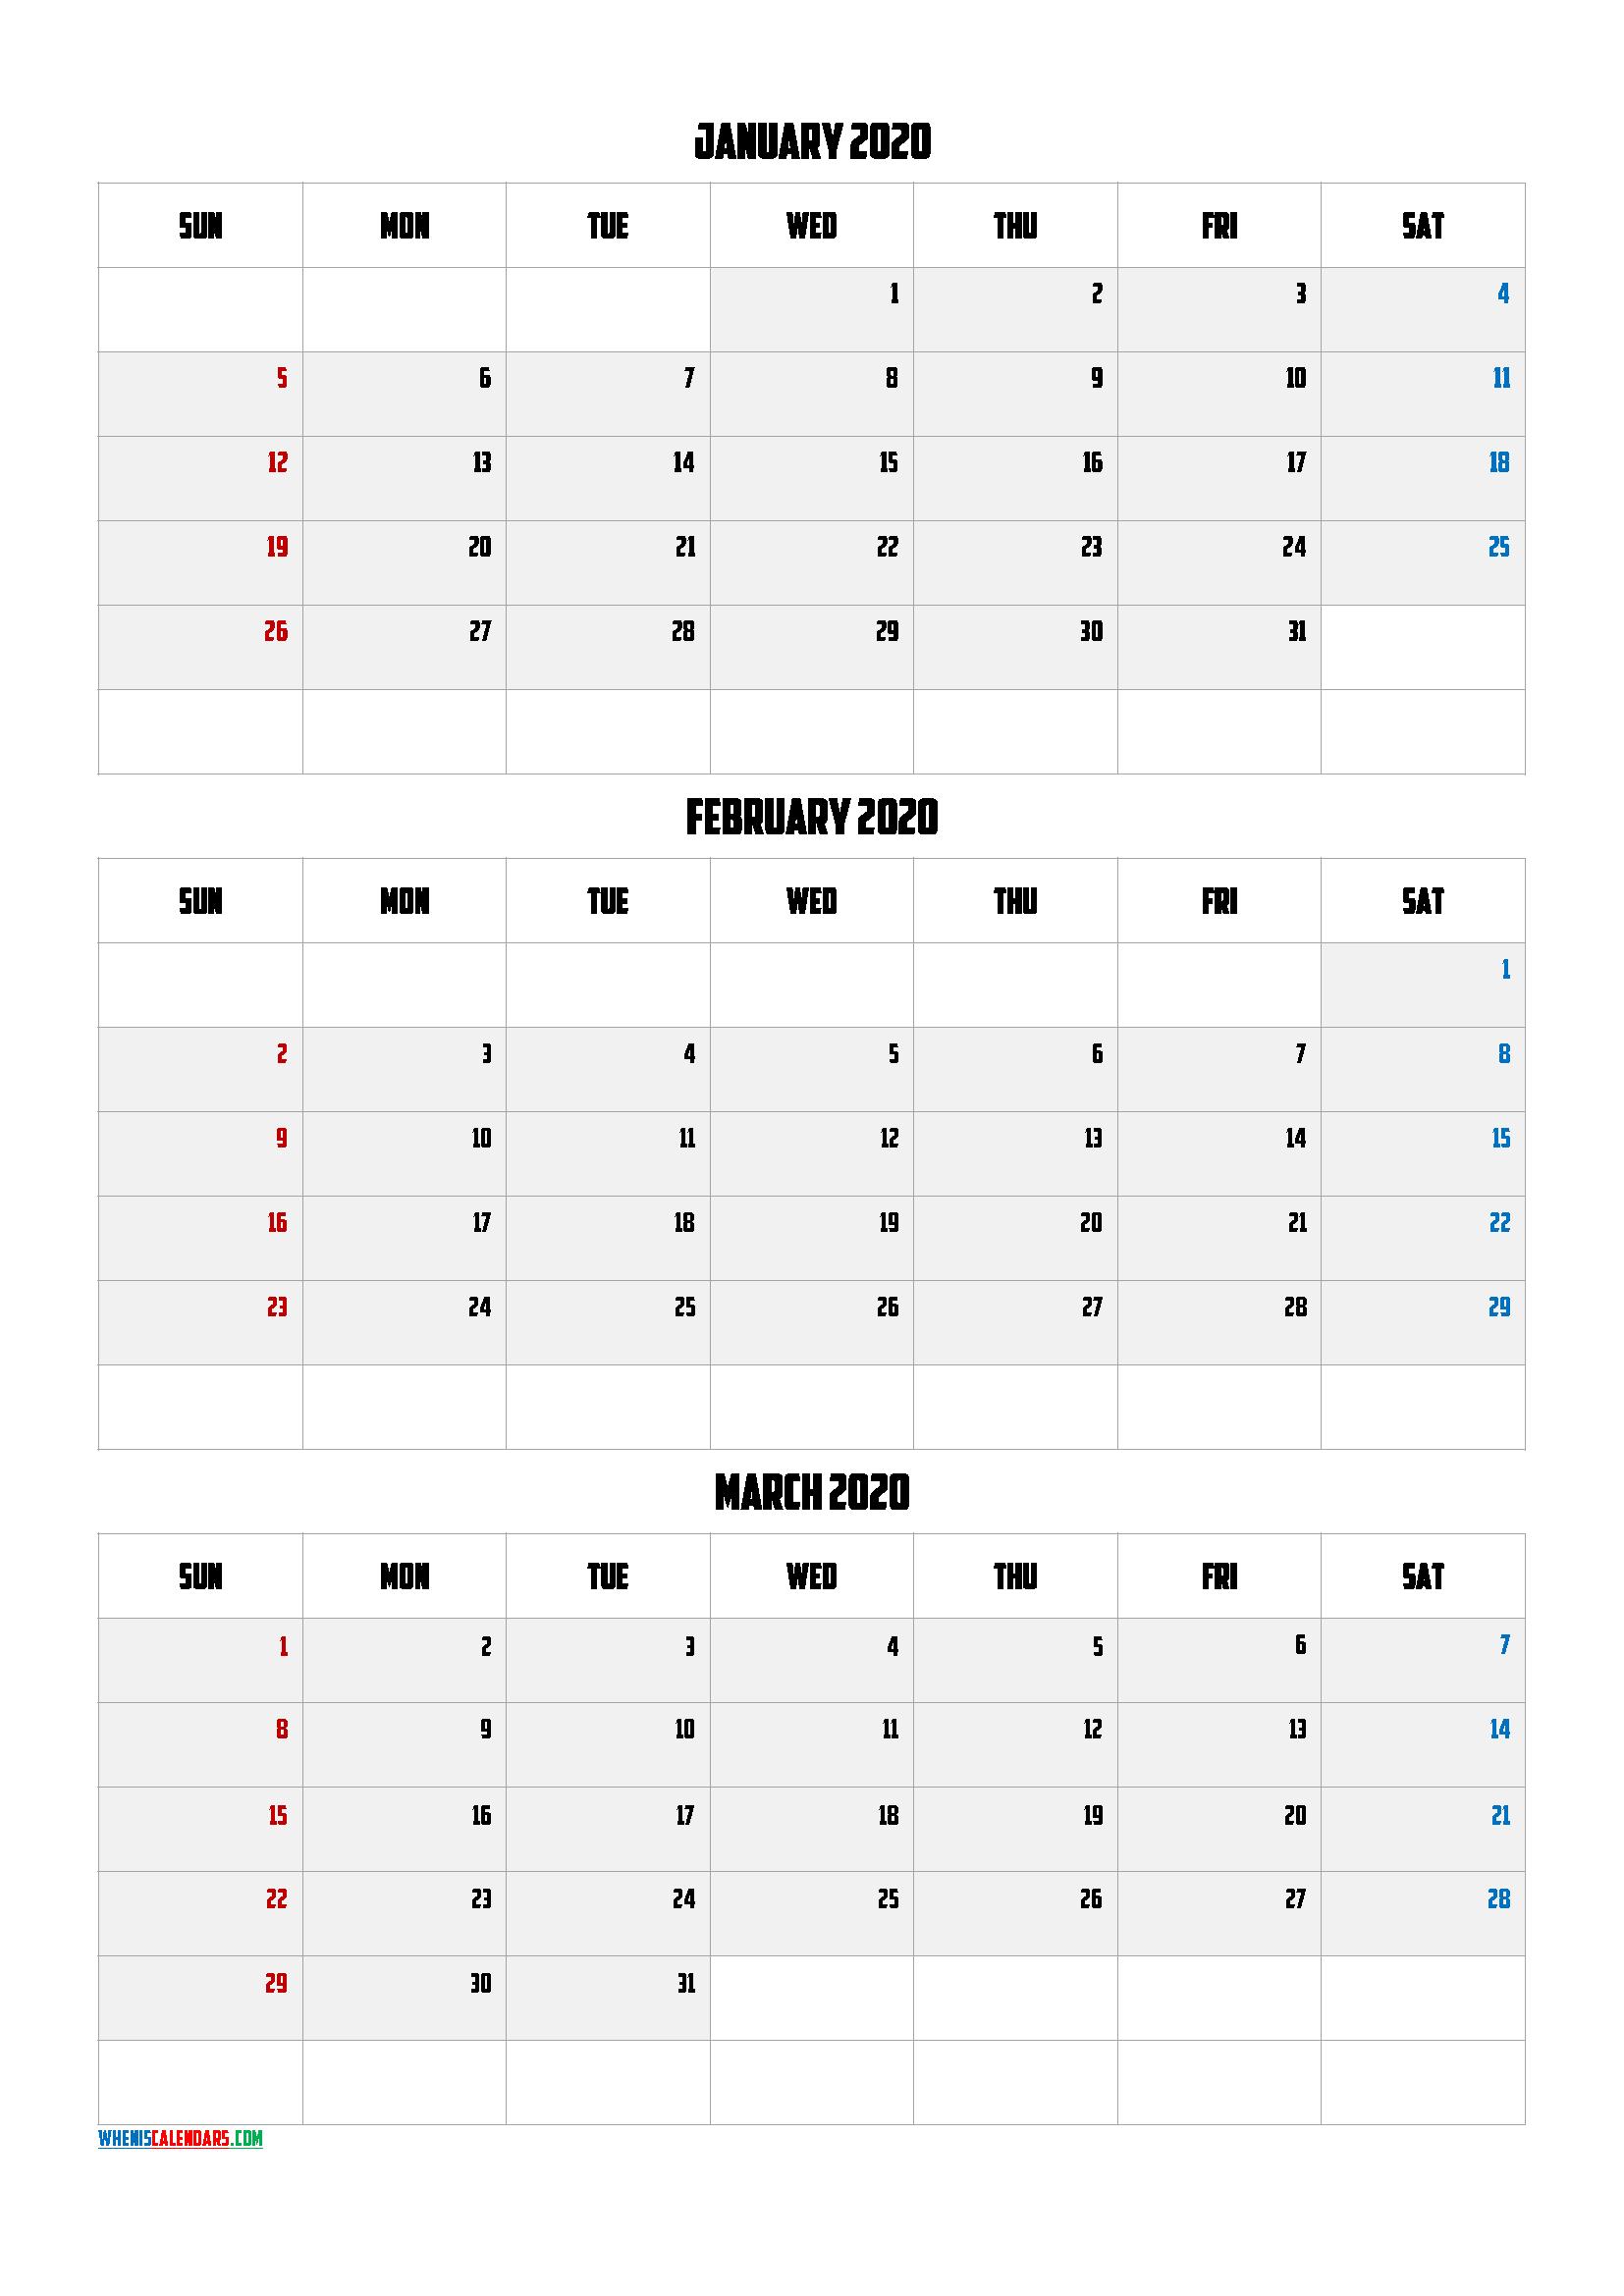 Calendar April May June 2020 [Q1 Q2 Q3 Q4] - Free 2020 And Throughout January February March April 2021 Calendar